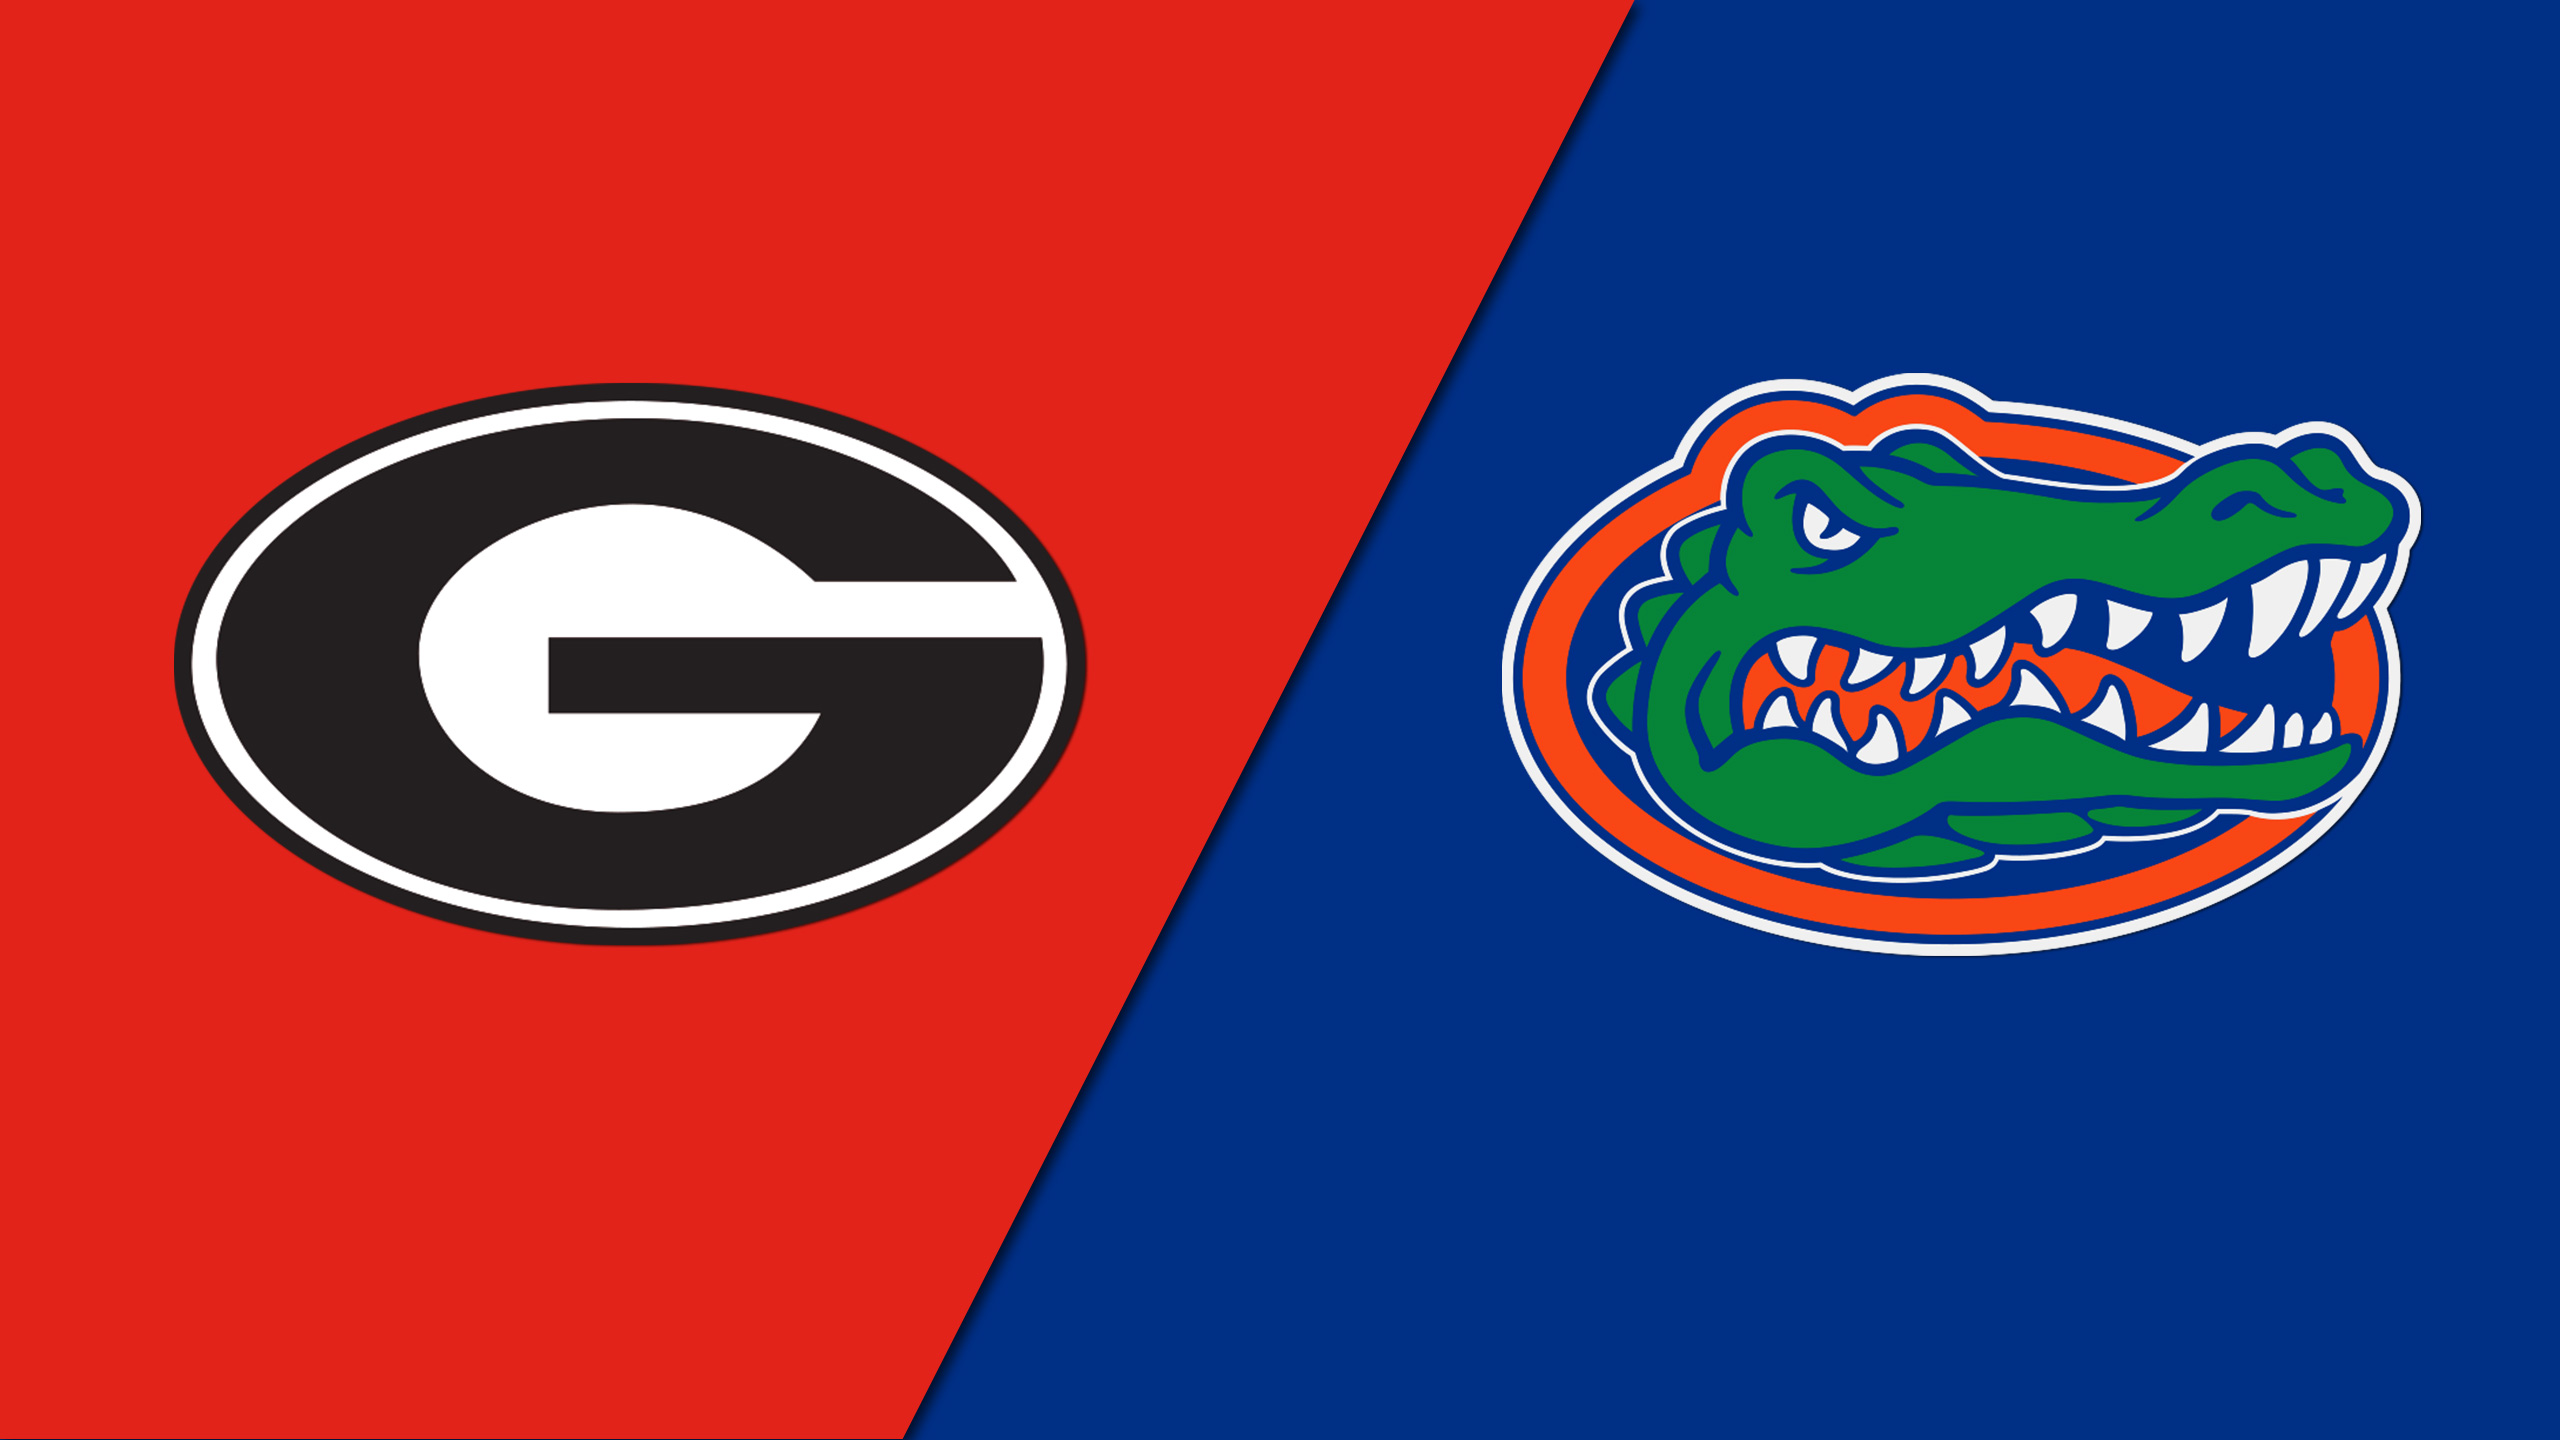 Georgia vs. Florida